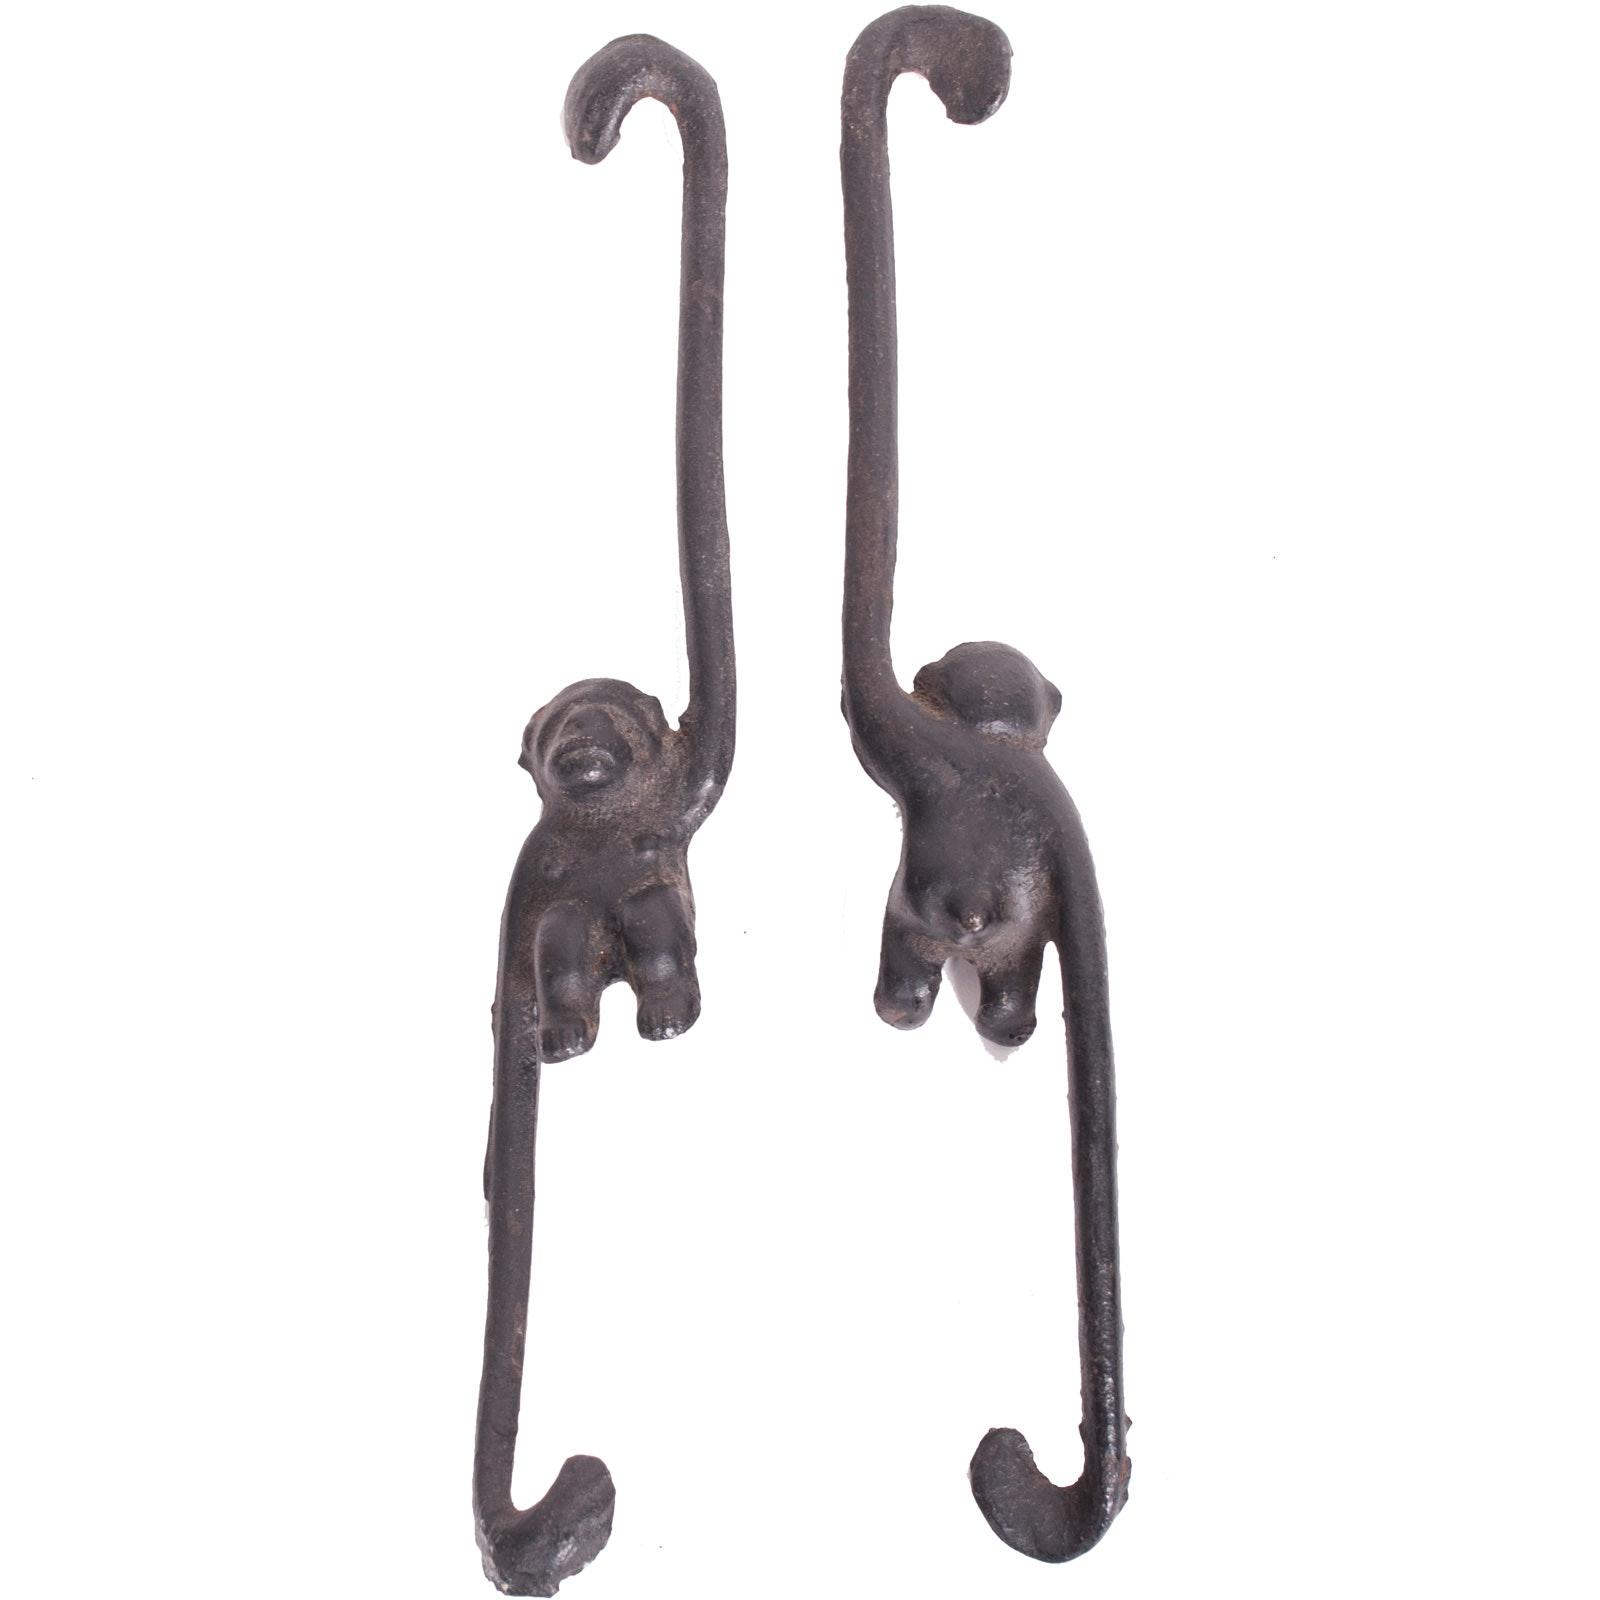 Vintage Cast Iron Monkey Plant Hangers